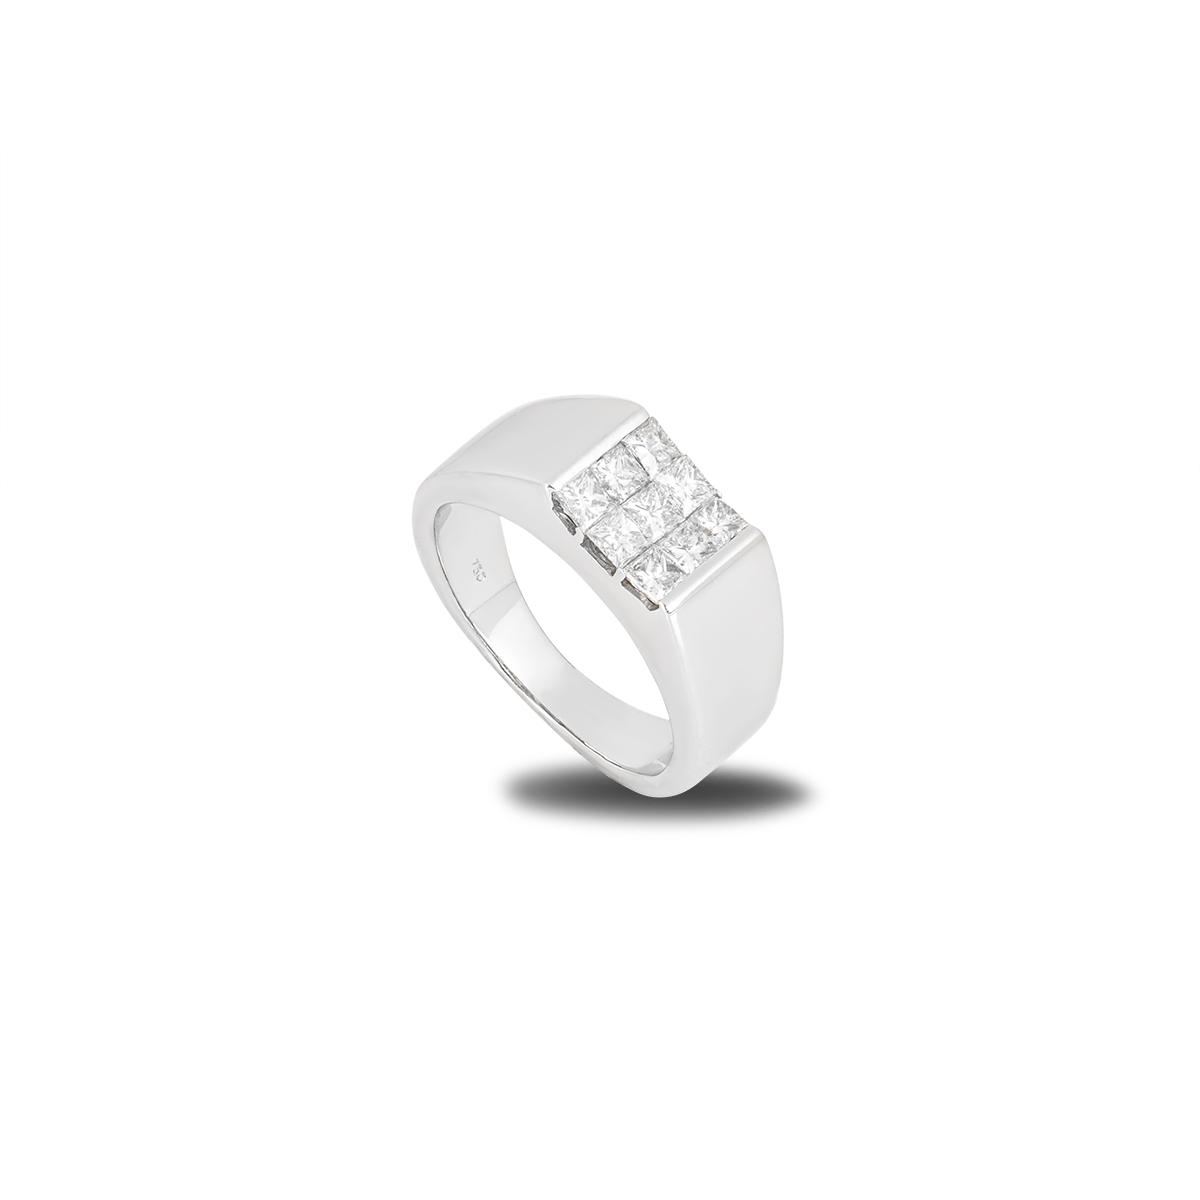 White Gold Princess Cut Diamond Signet Ring